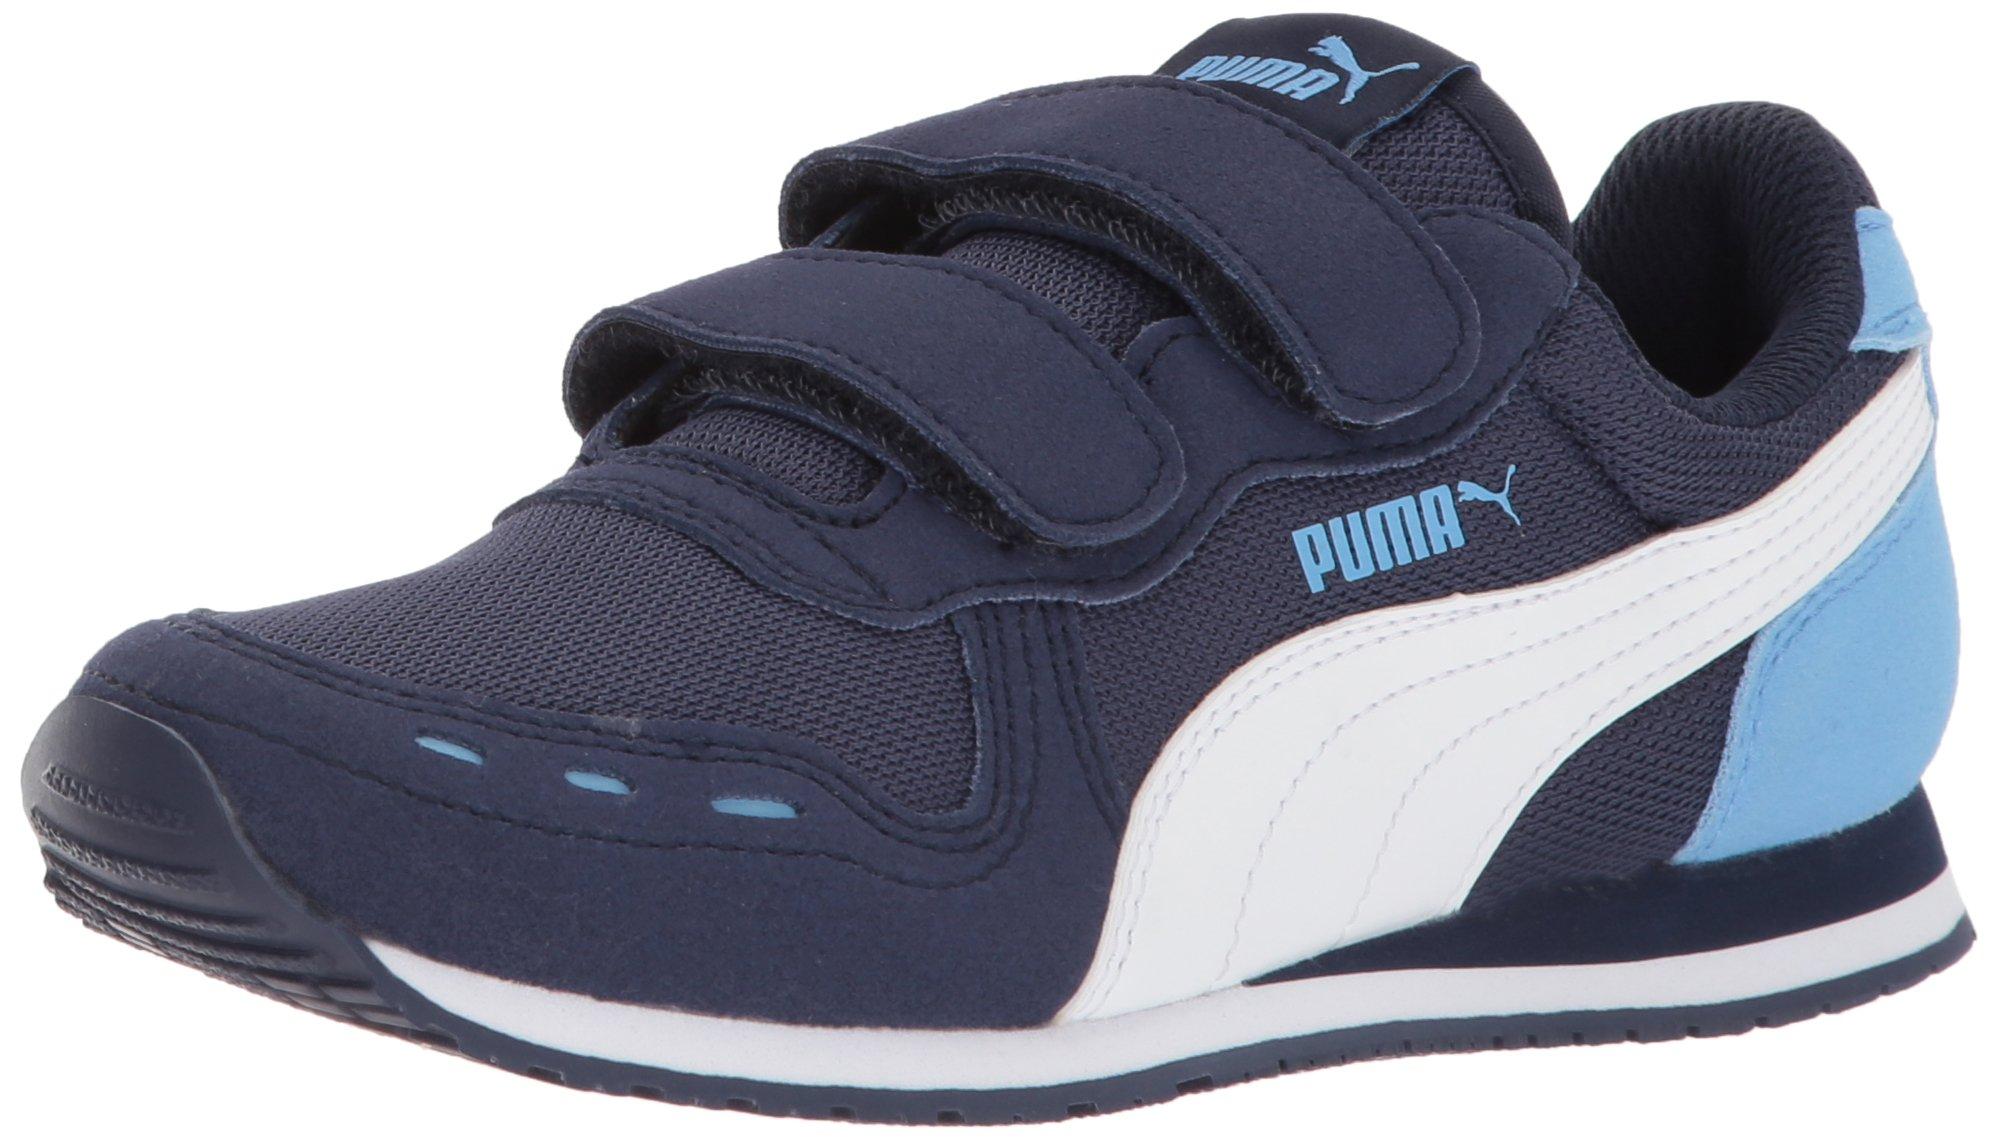 PUMA Kids' Cabana Racer Mesh V PS Sneaker, peacoat-puma white-little boy blue, 12 M US Little Kid